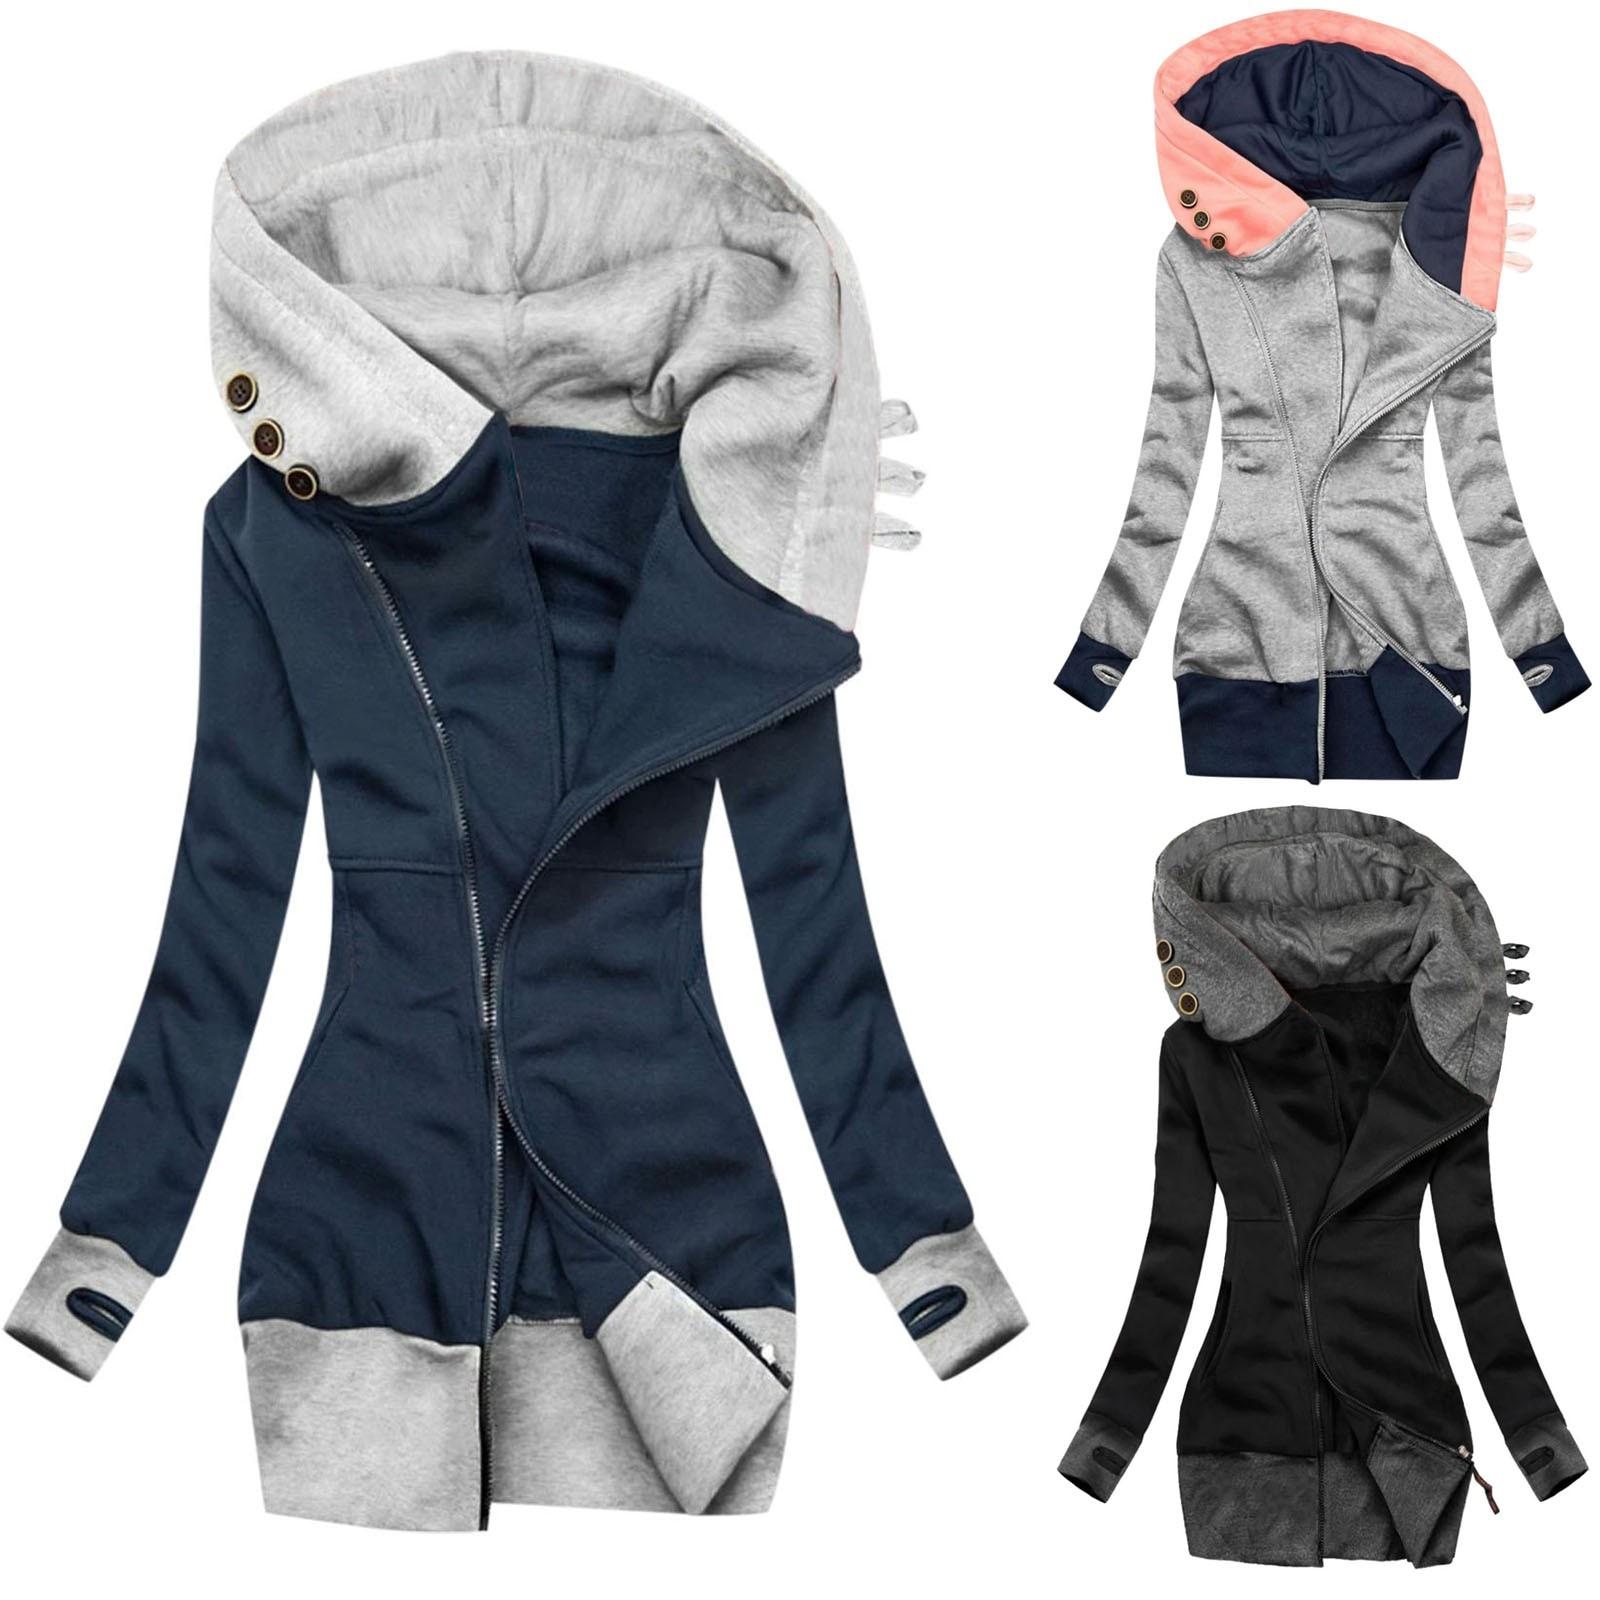 2020 Hot Sale New Design Styele Casual Clothing Sweatwear Sweet Sexy Fashion Soft Good Fabric Women Jackets 1